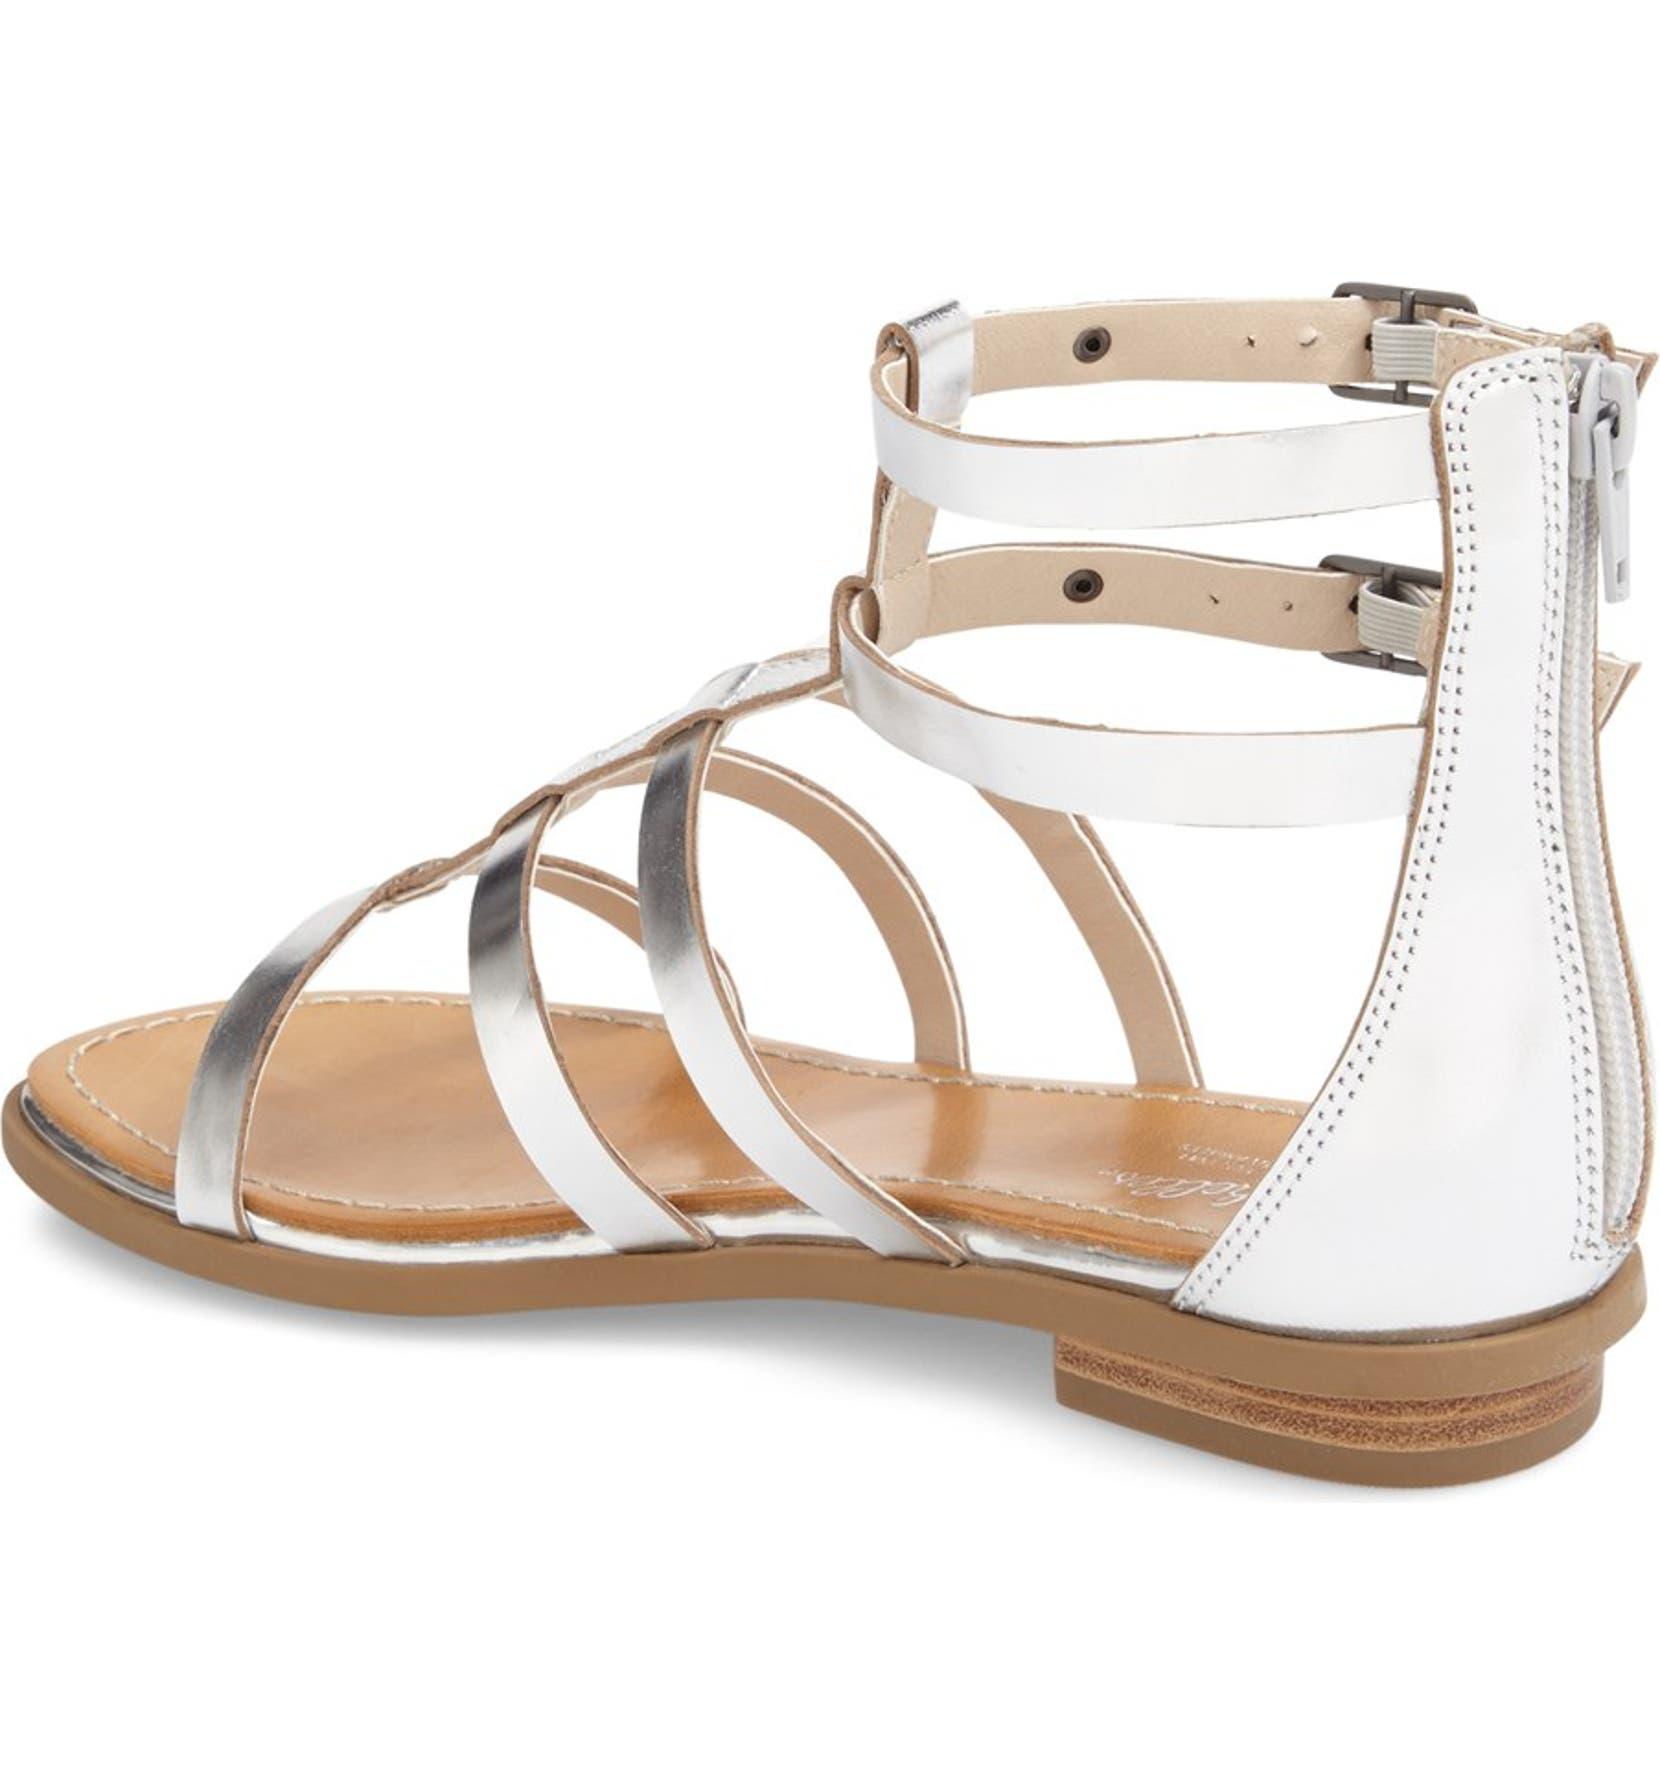 3b564809365ef Seychelles 'Peachy' Gladiator Flat Sandal (Women) | Nordstrom